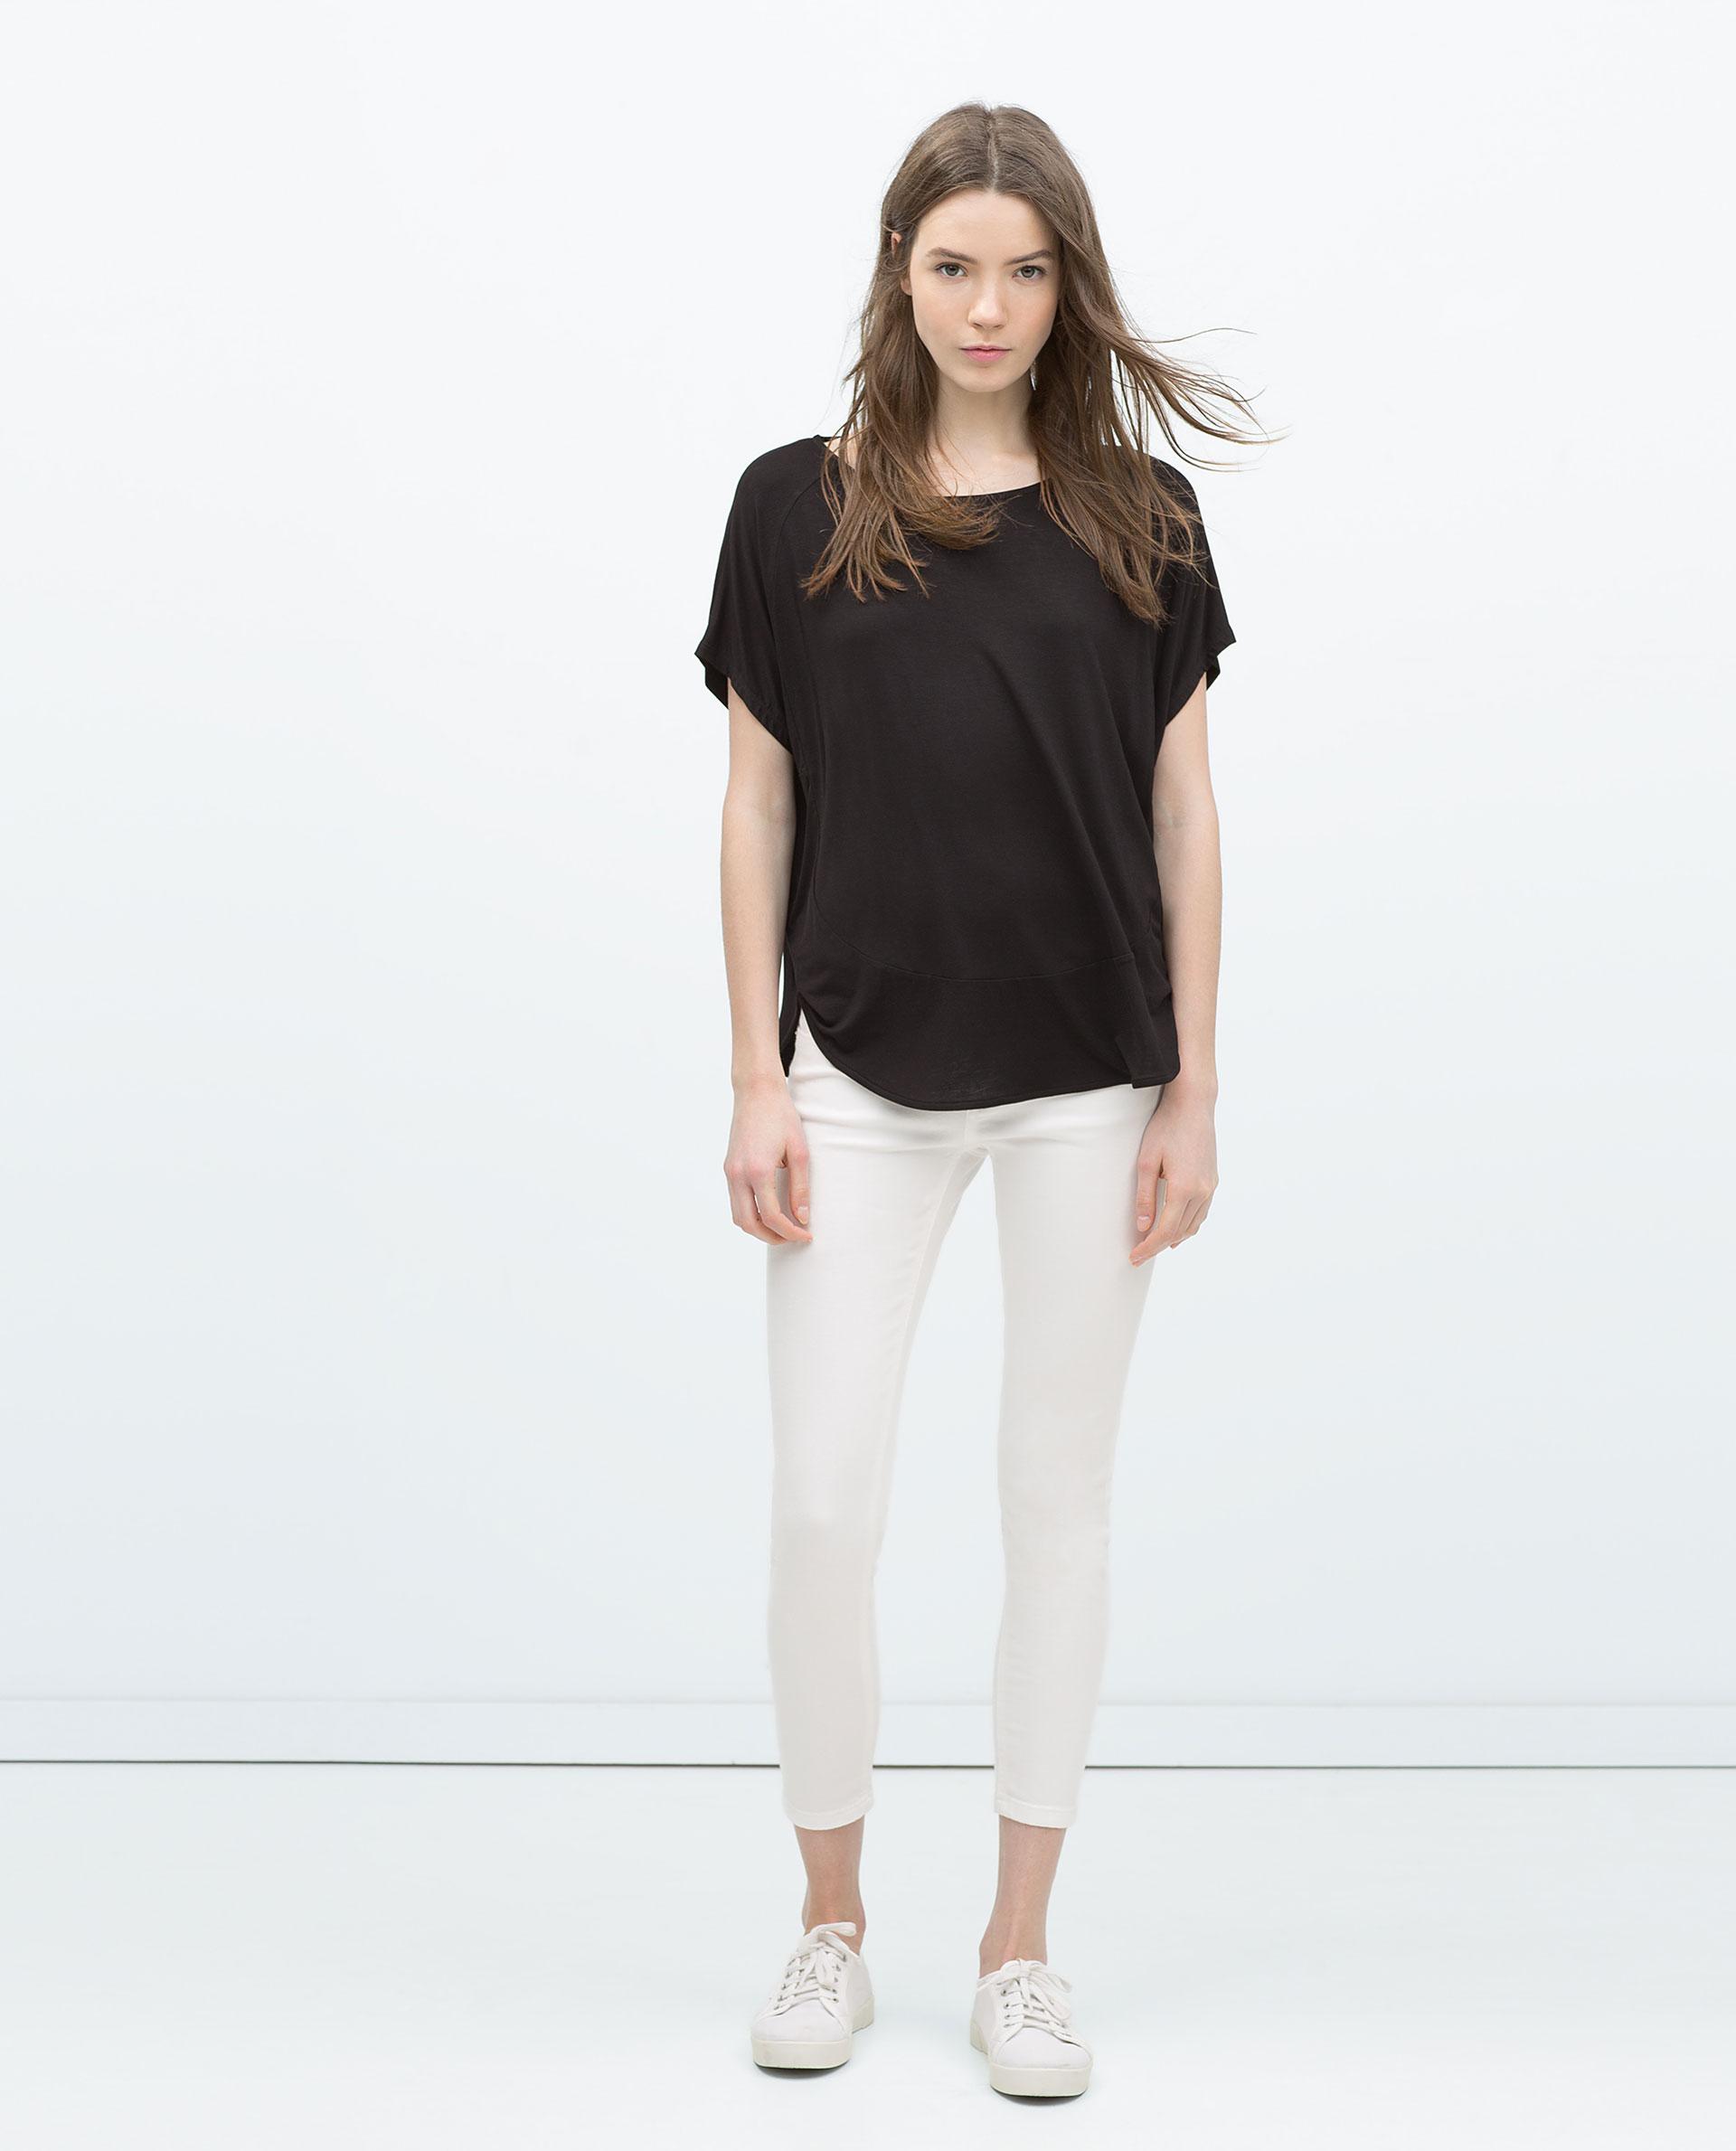 Zara short sleeve striped t shirt in black lyst for Zara black t shirt dress